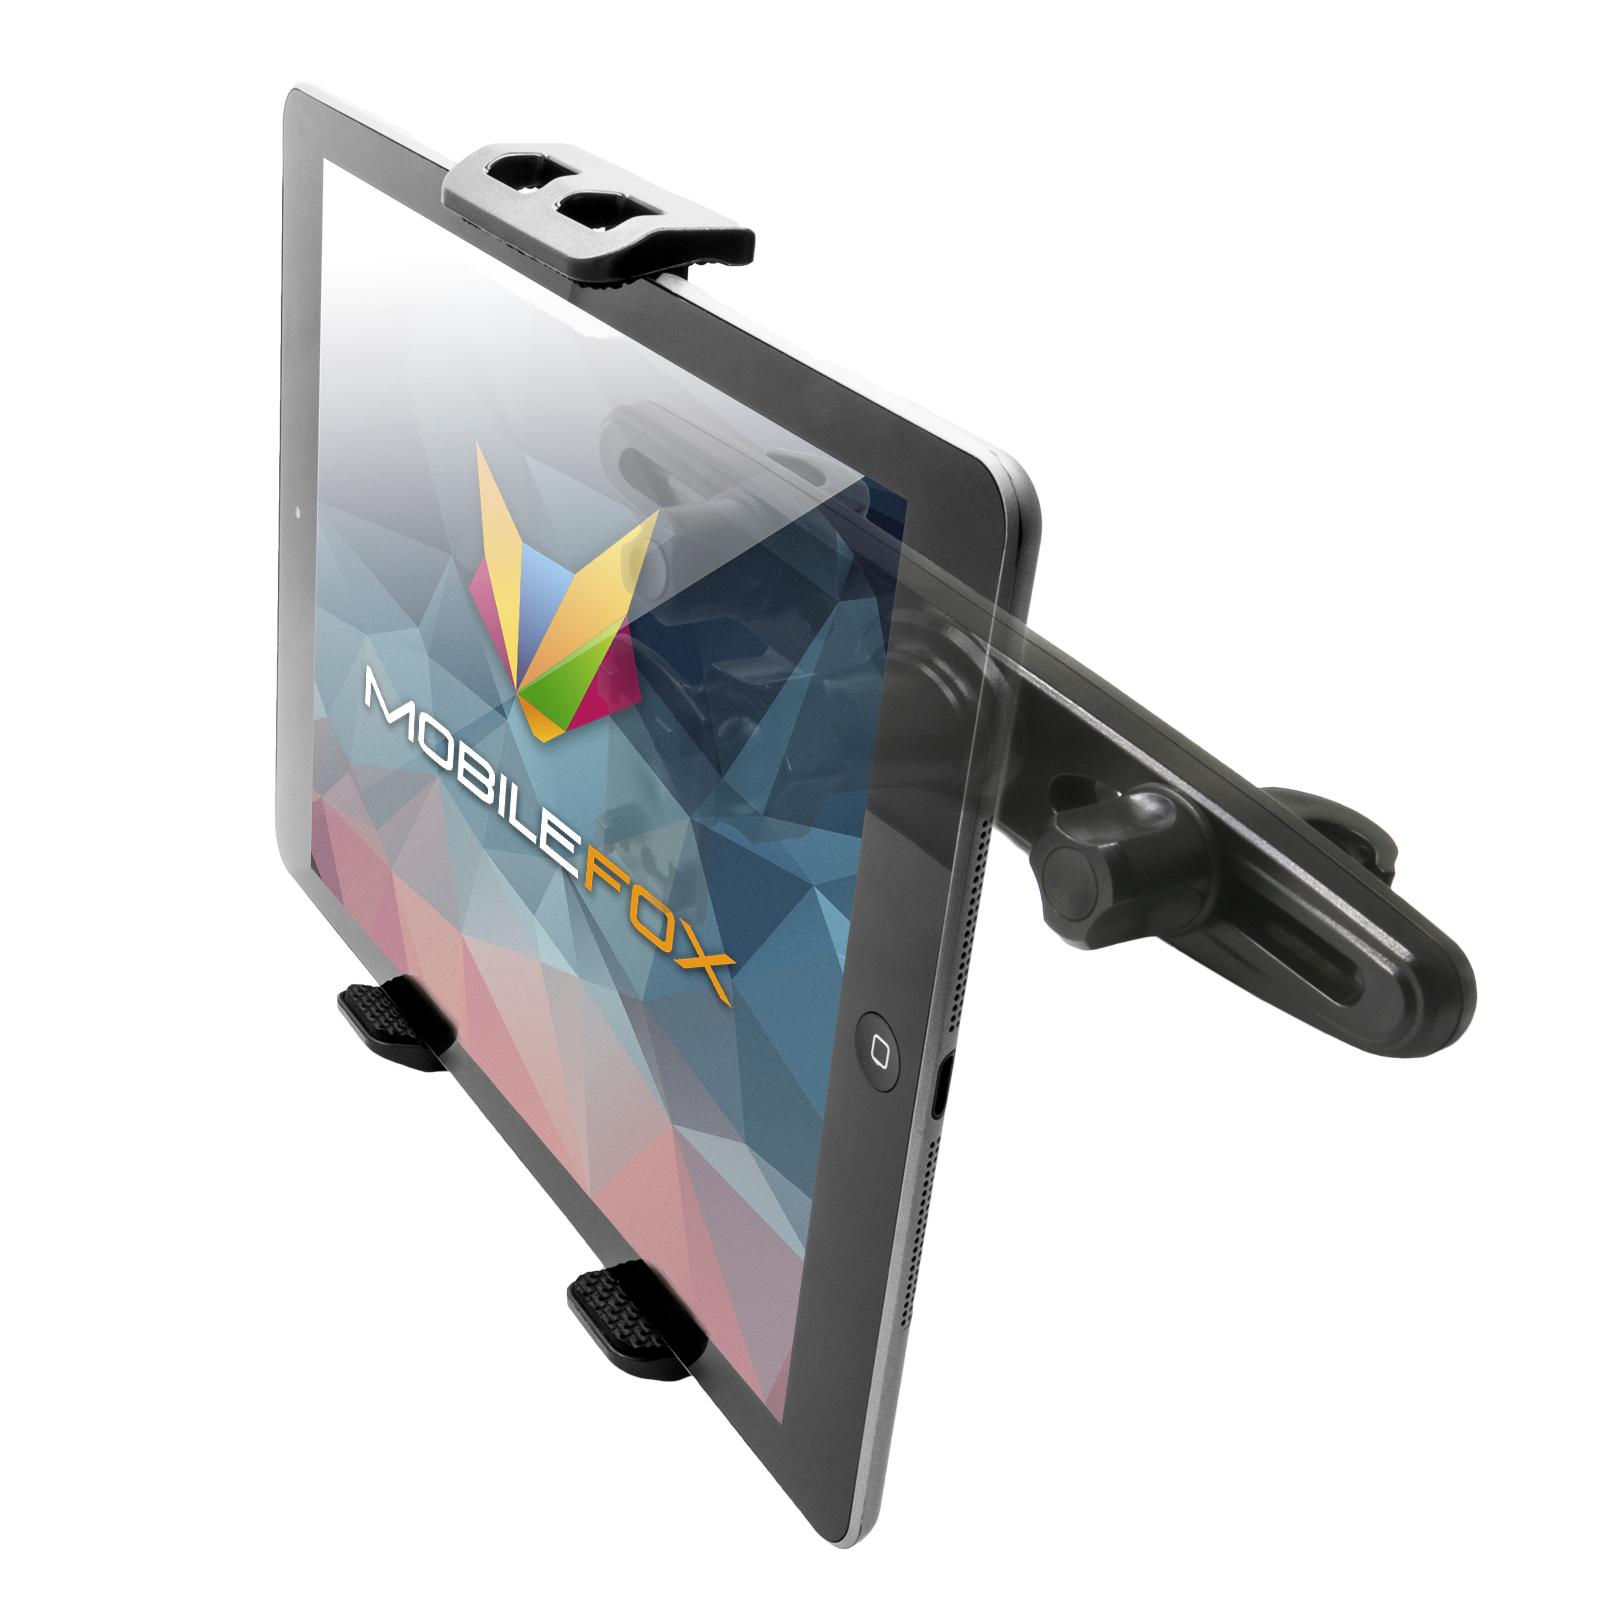 mobilefox 360 kfz kopfst tzen tablet halterung auto kugelgelenk halter f r universal alle. Black Bedroom Furniture Sets. Home Design Ideas